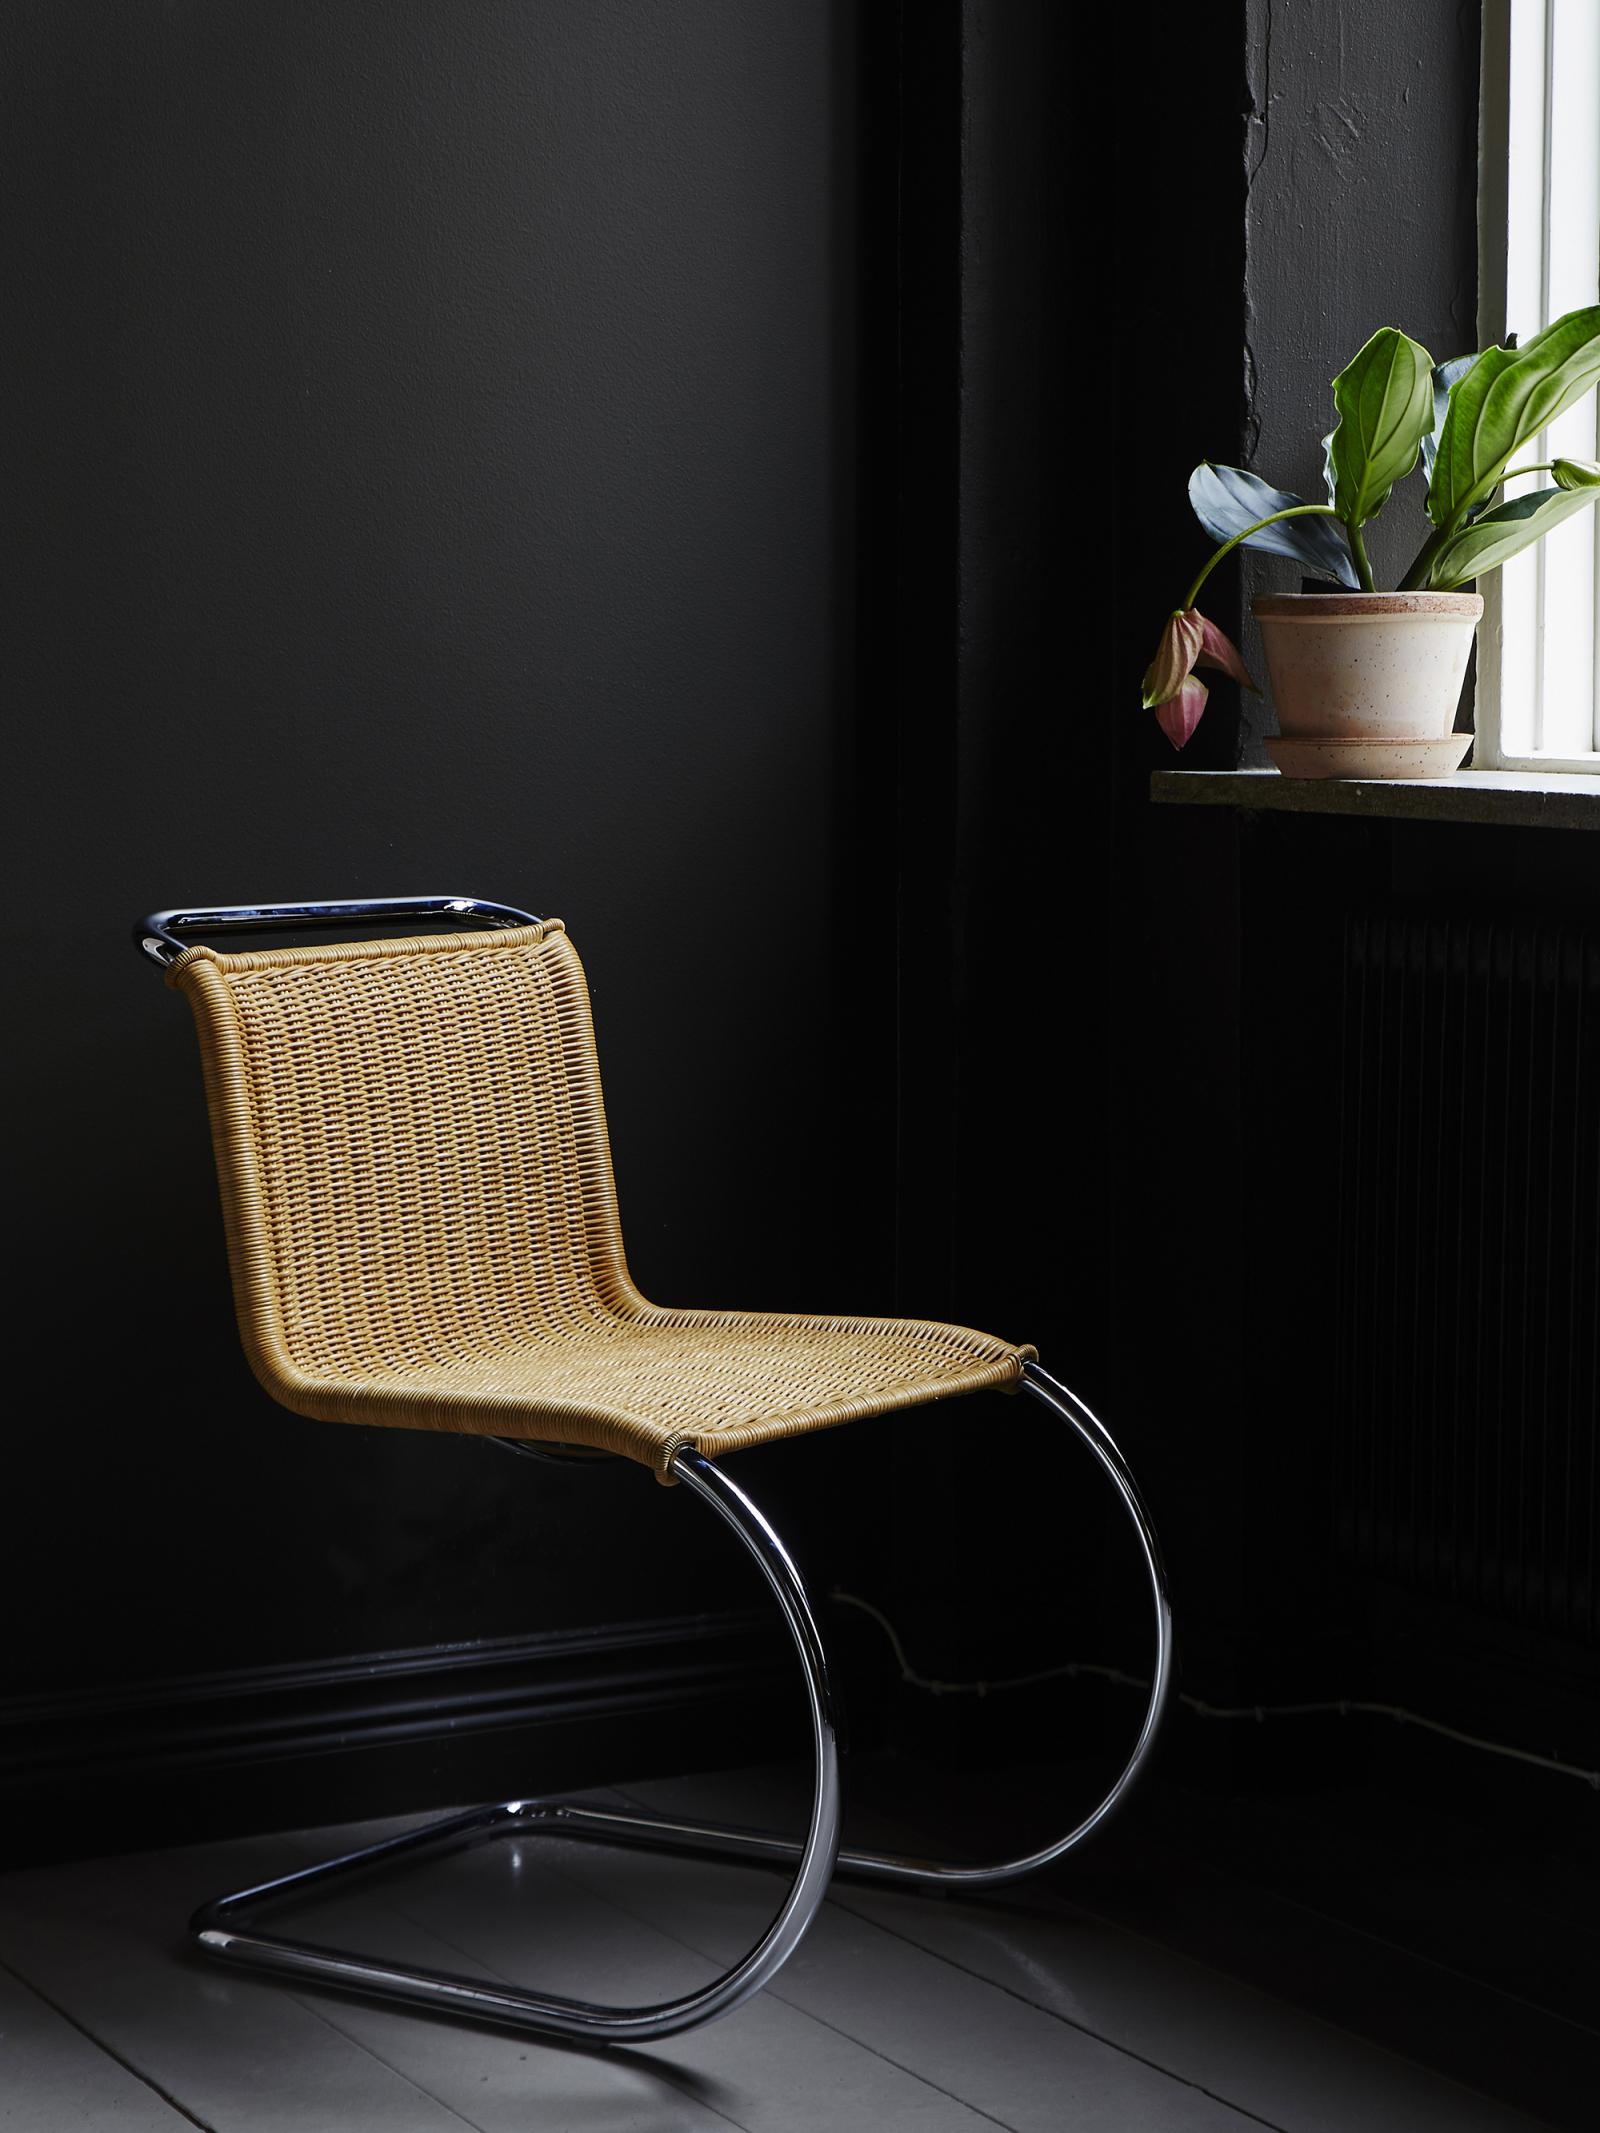 MR Chair Rattan - Knoll